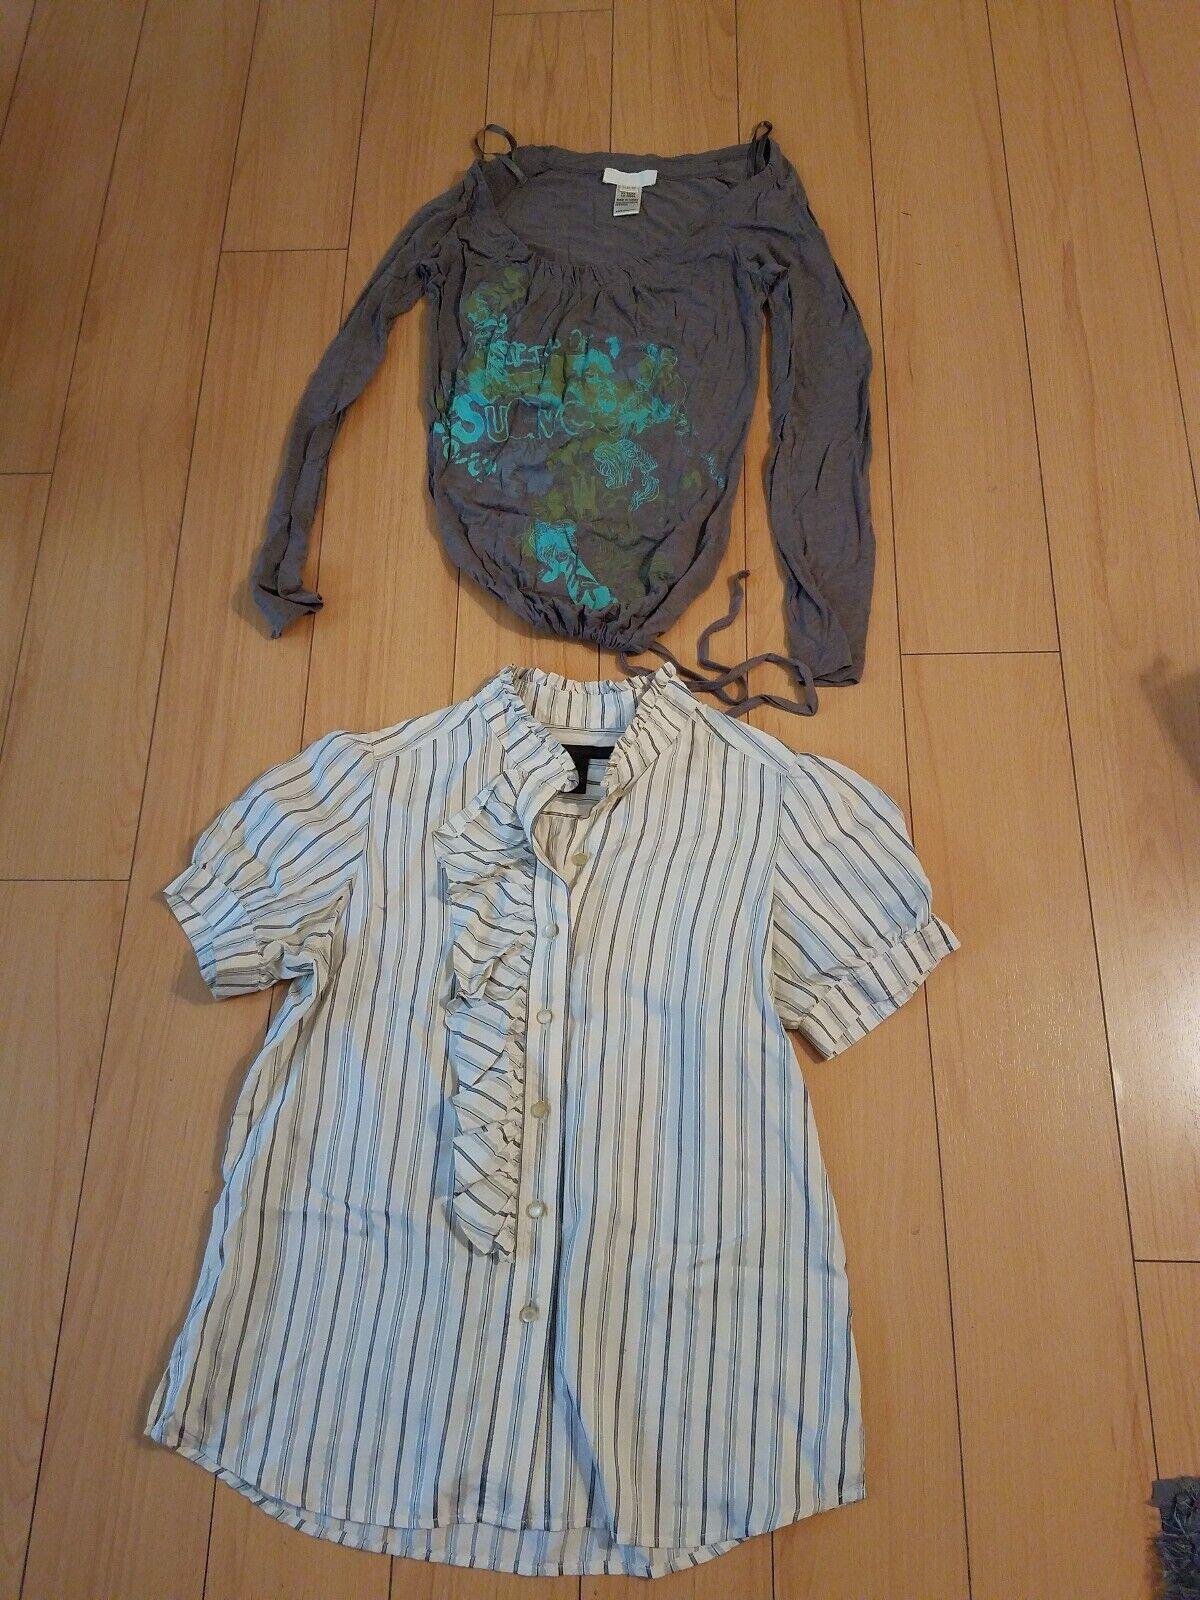 damen Diesel& Marc Jacobs Shirt Größe Xs 6